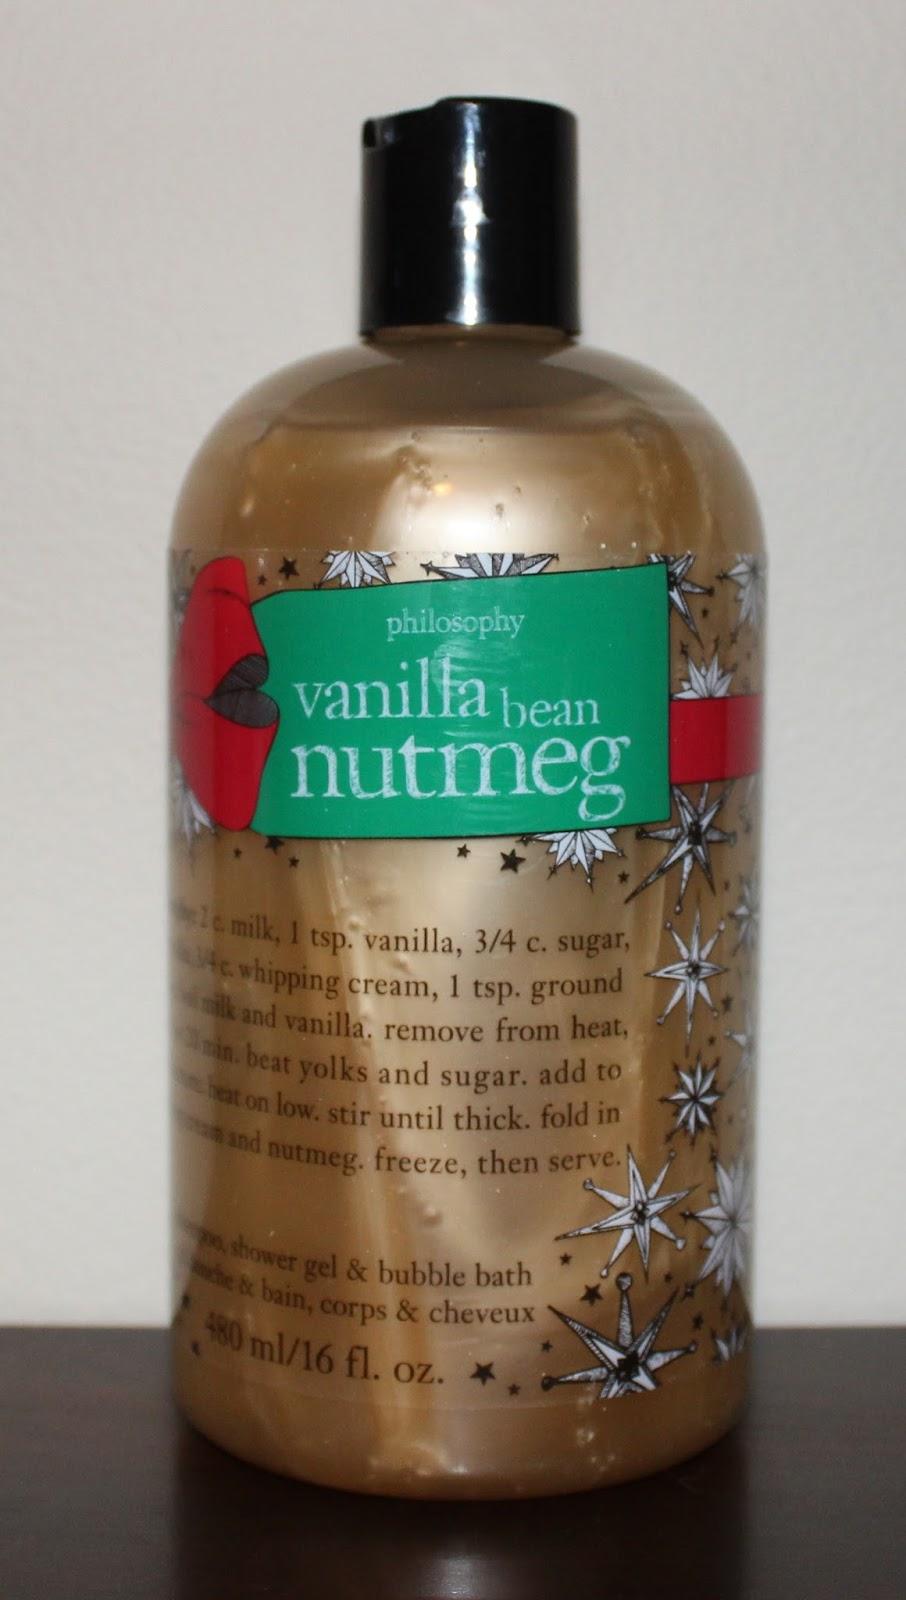 beyond blush philosophy holiday 2015 gift ideas philsophy vanilla bean nutmeg 3 in 1 shampoo shower gel bubble bath